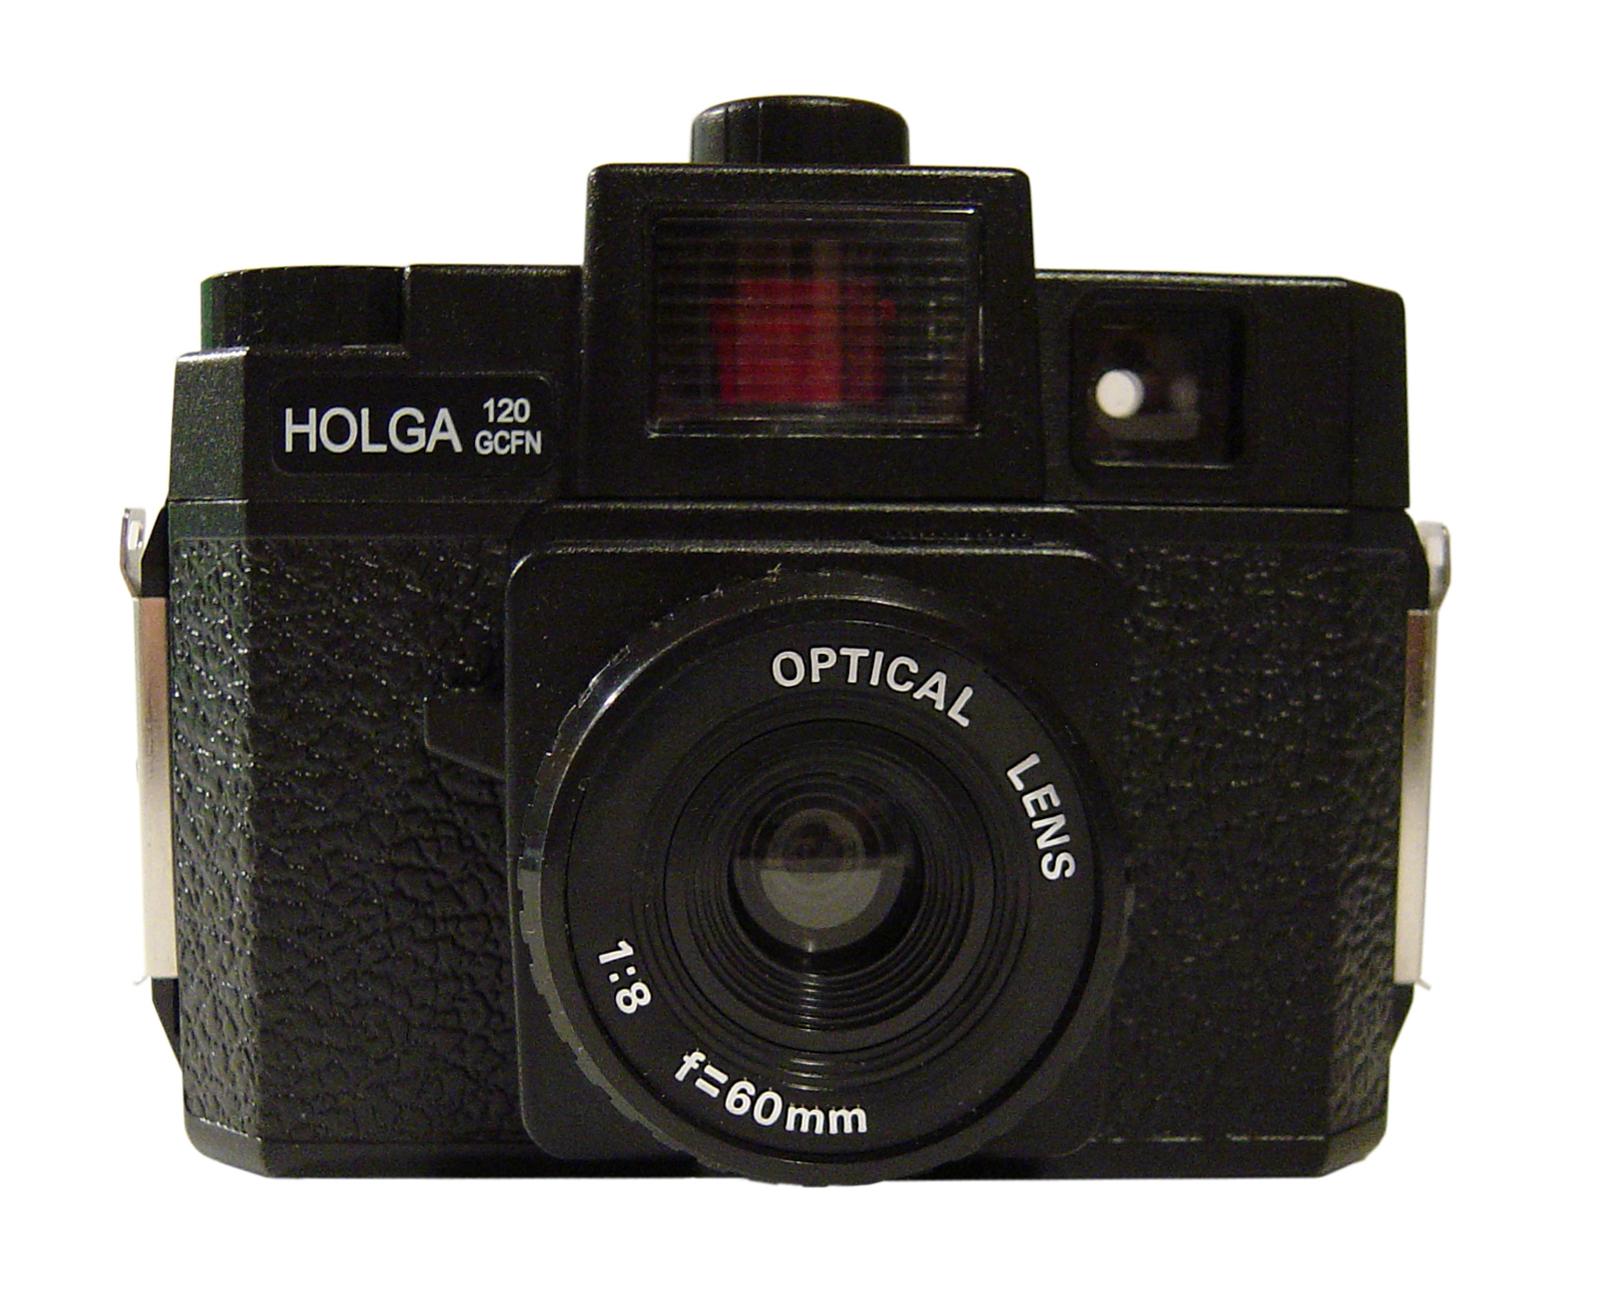 http://upload.wikimedia.org/wikipedia/commons/b/b6/Holga_120_GCFN.jpg